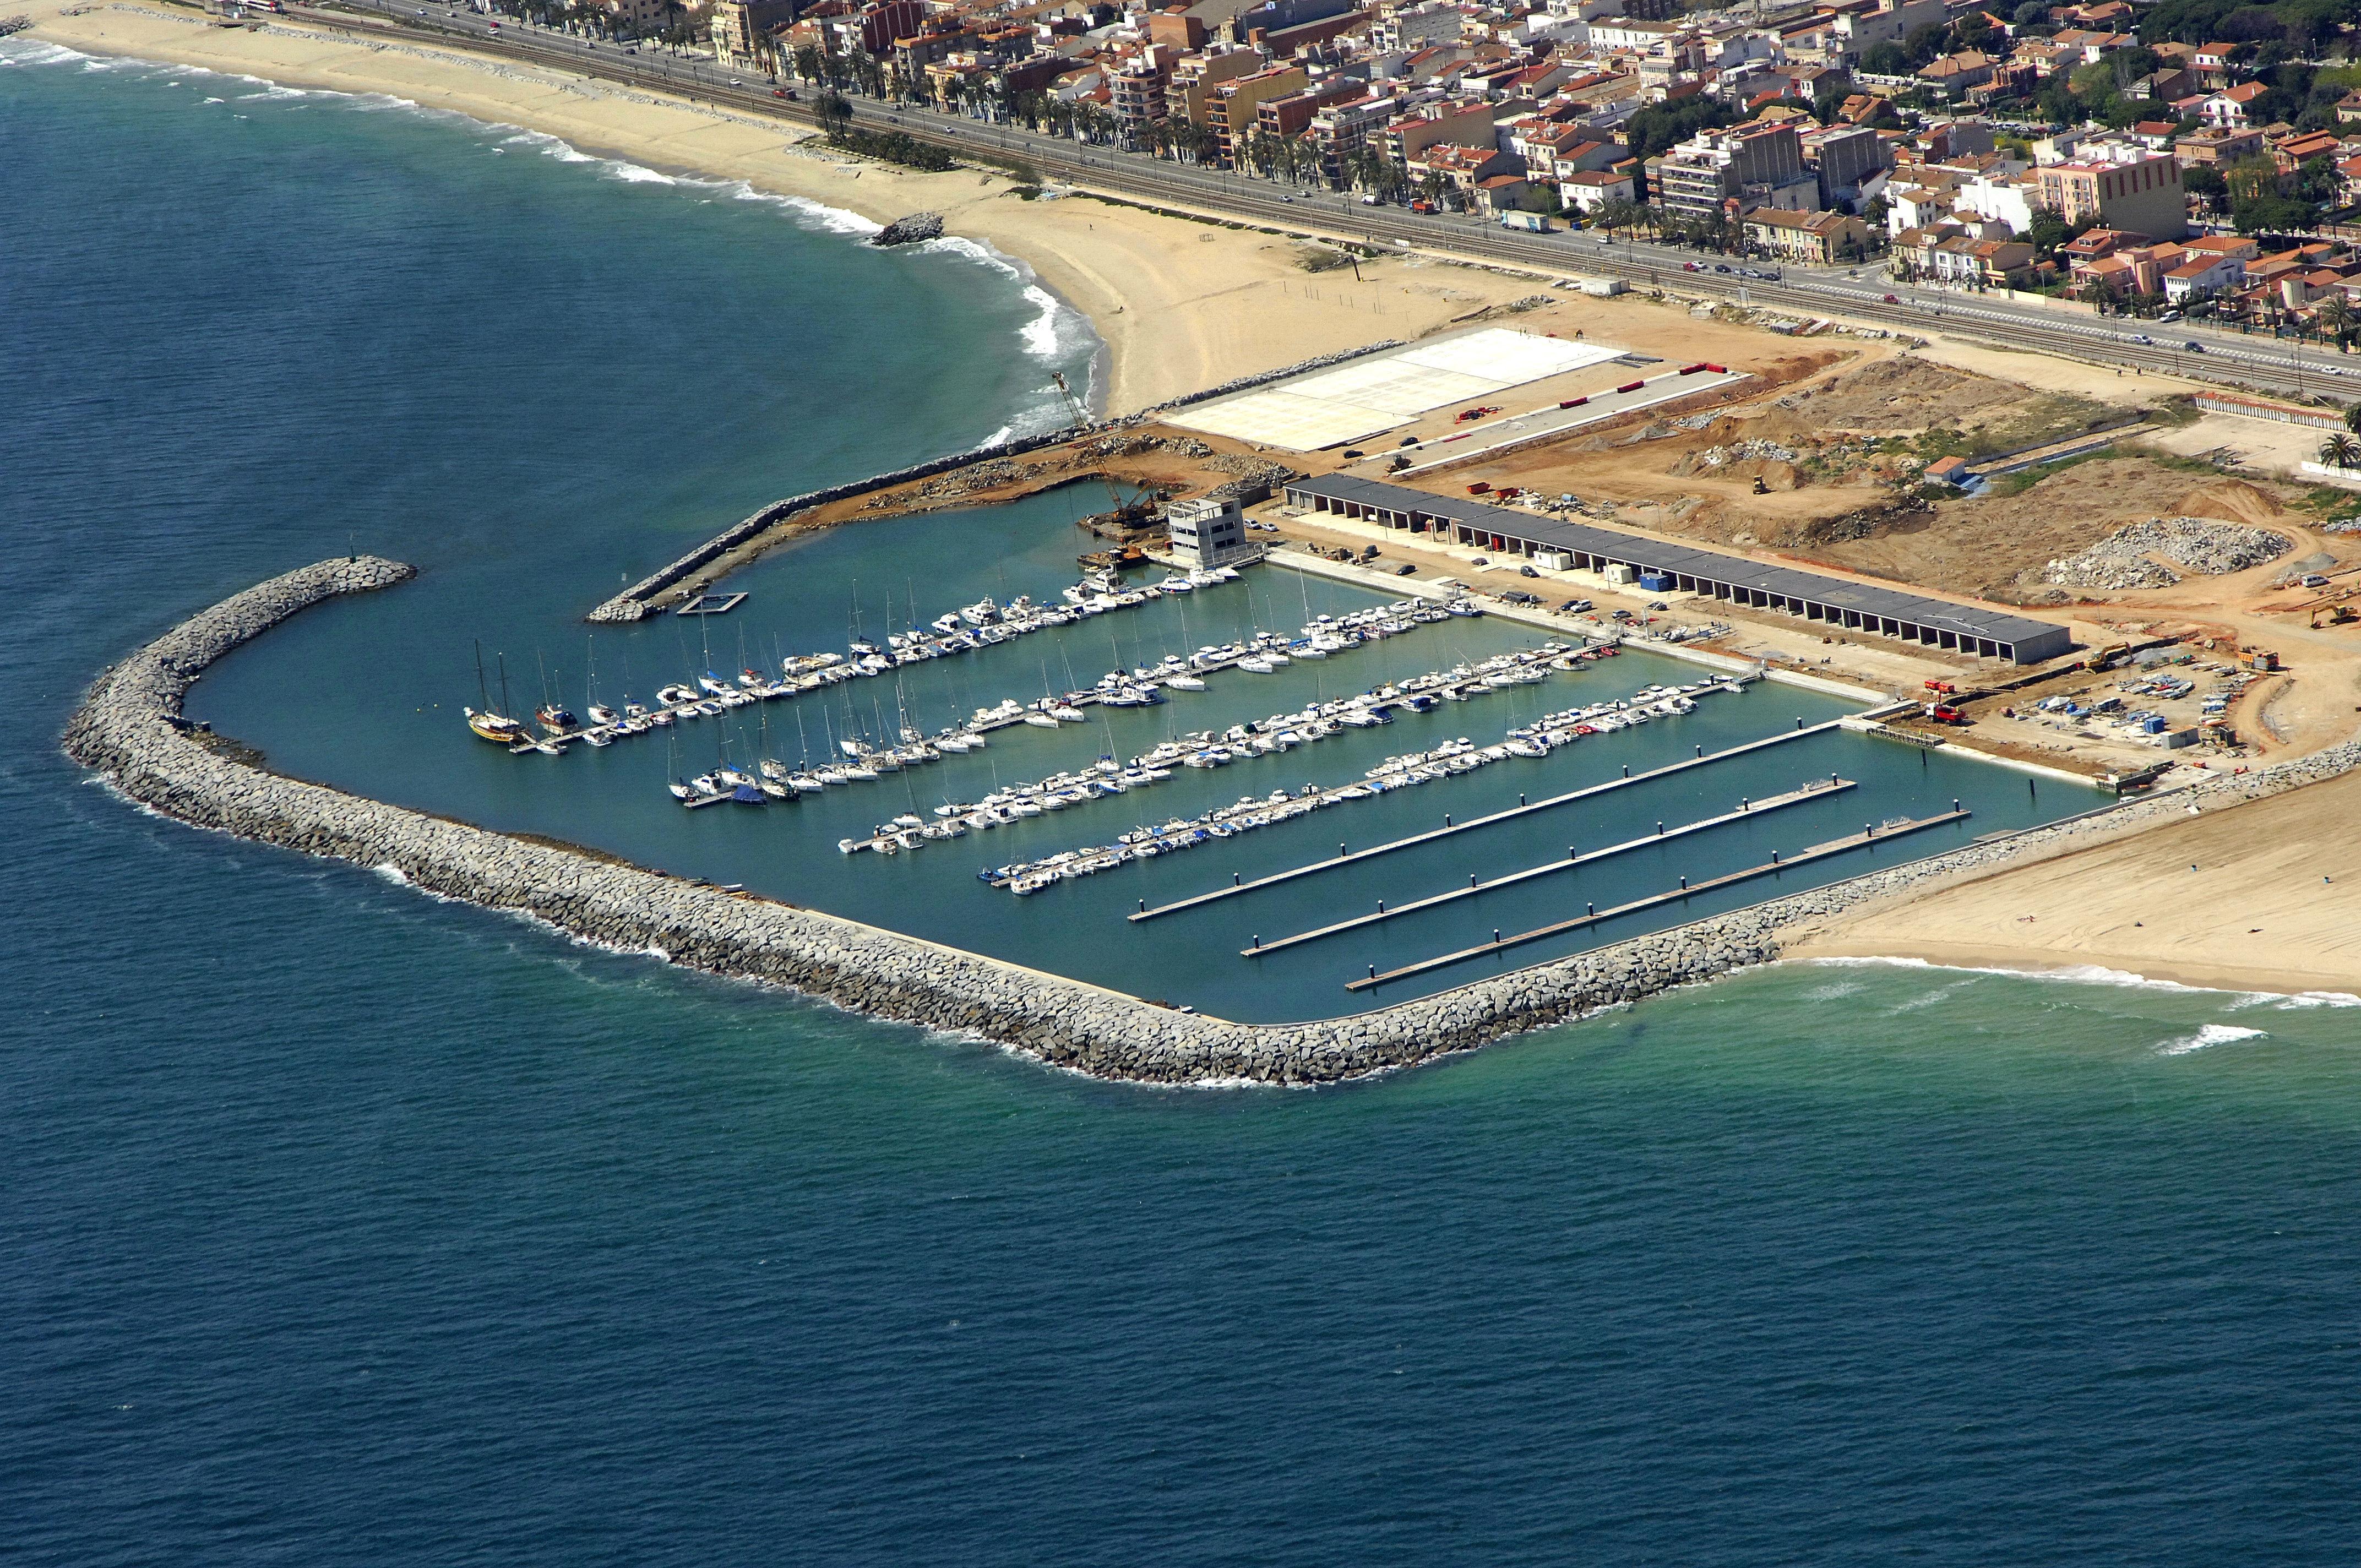 Premia de mar marina in premia de mar catalonia spain for Piscina premia de mar